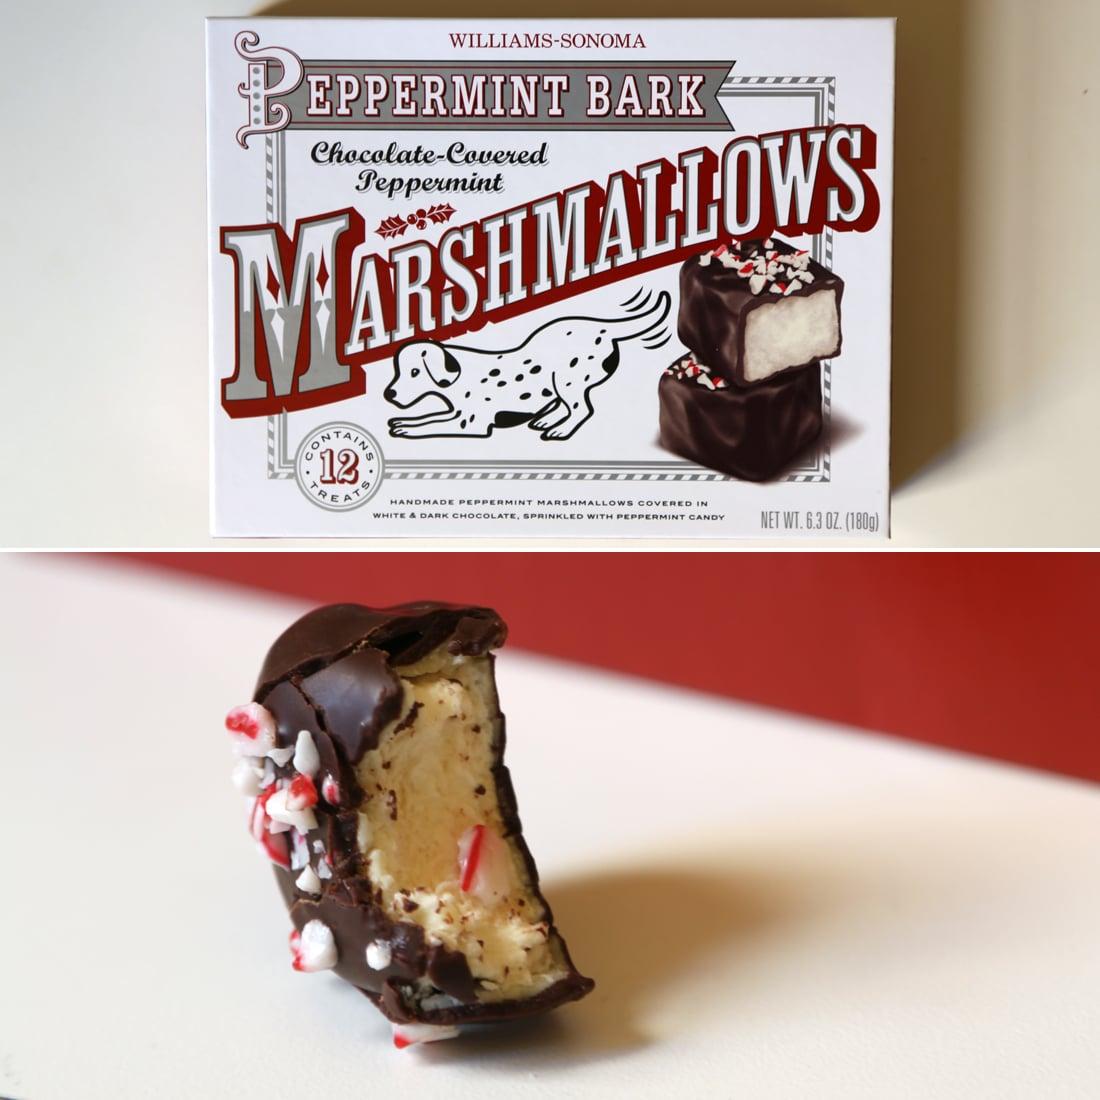 Williams-Sonoma Peppermint Bark Marshmallow